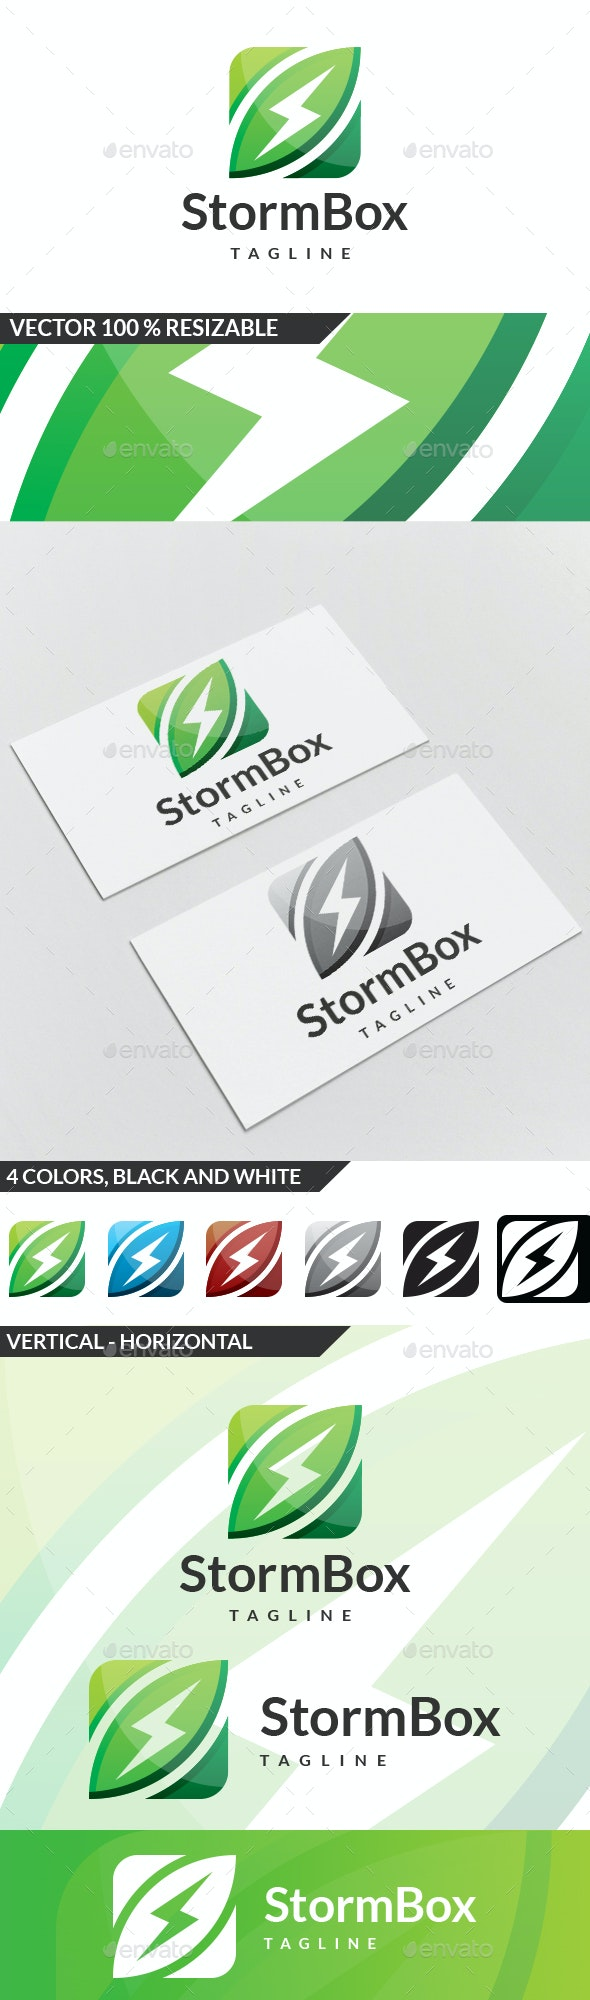 Storm Box Logo - Symbols Logo Templates